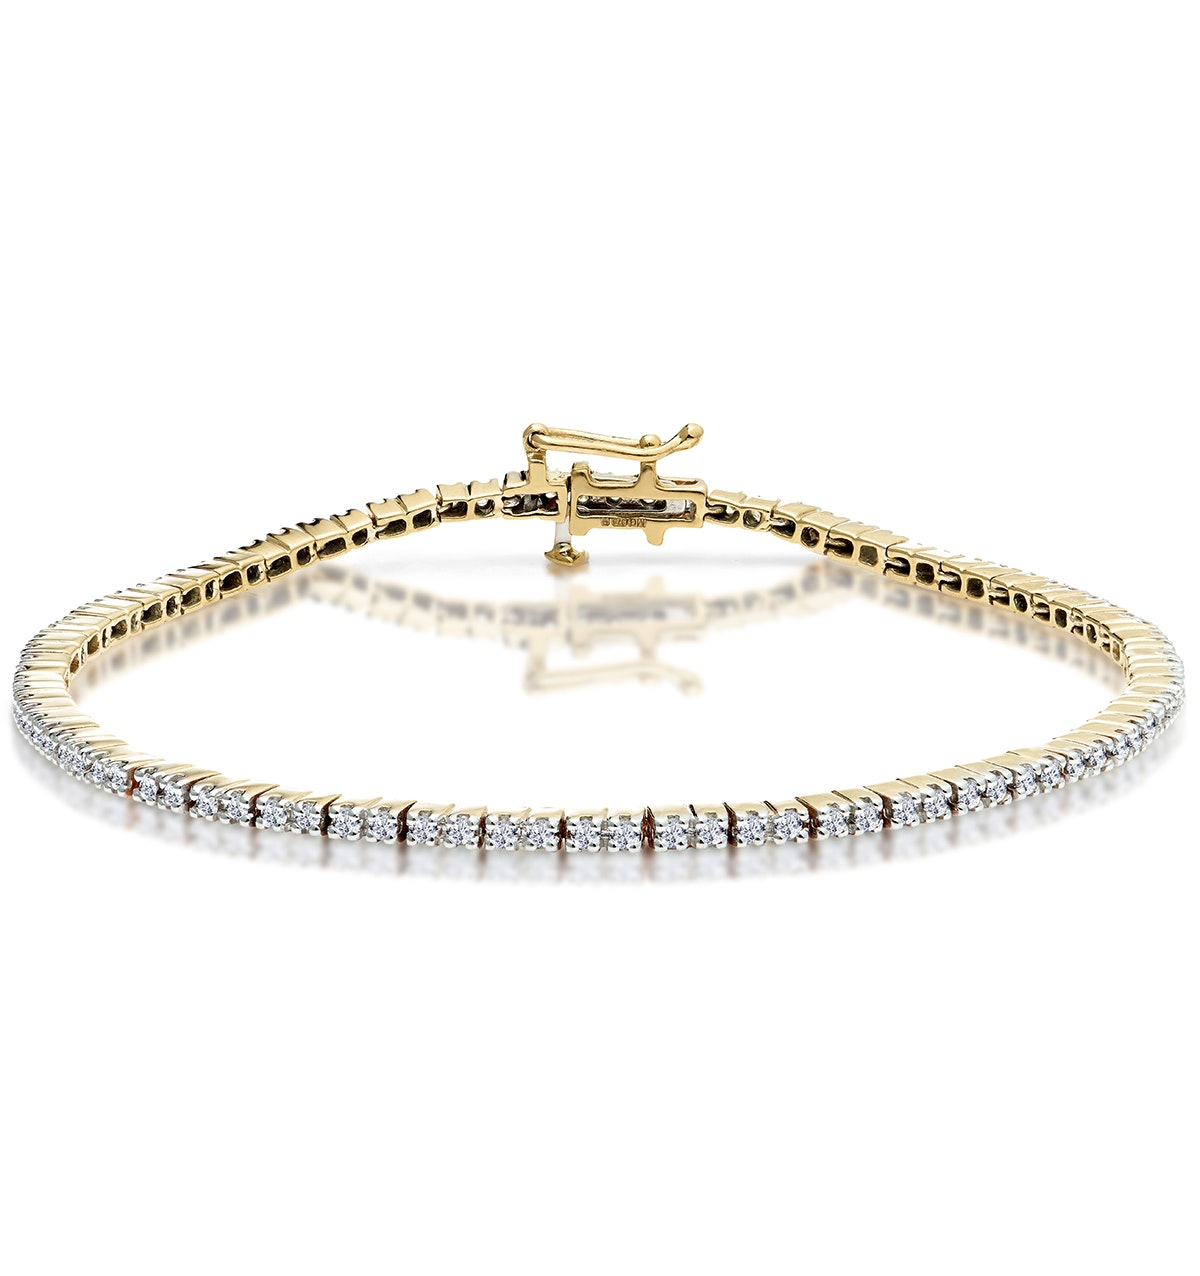 1ct Diamond Tennis Bracelet Claw Set in 9K Yellow Gold